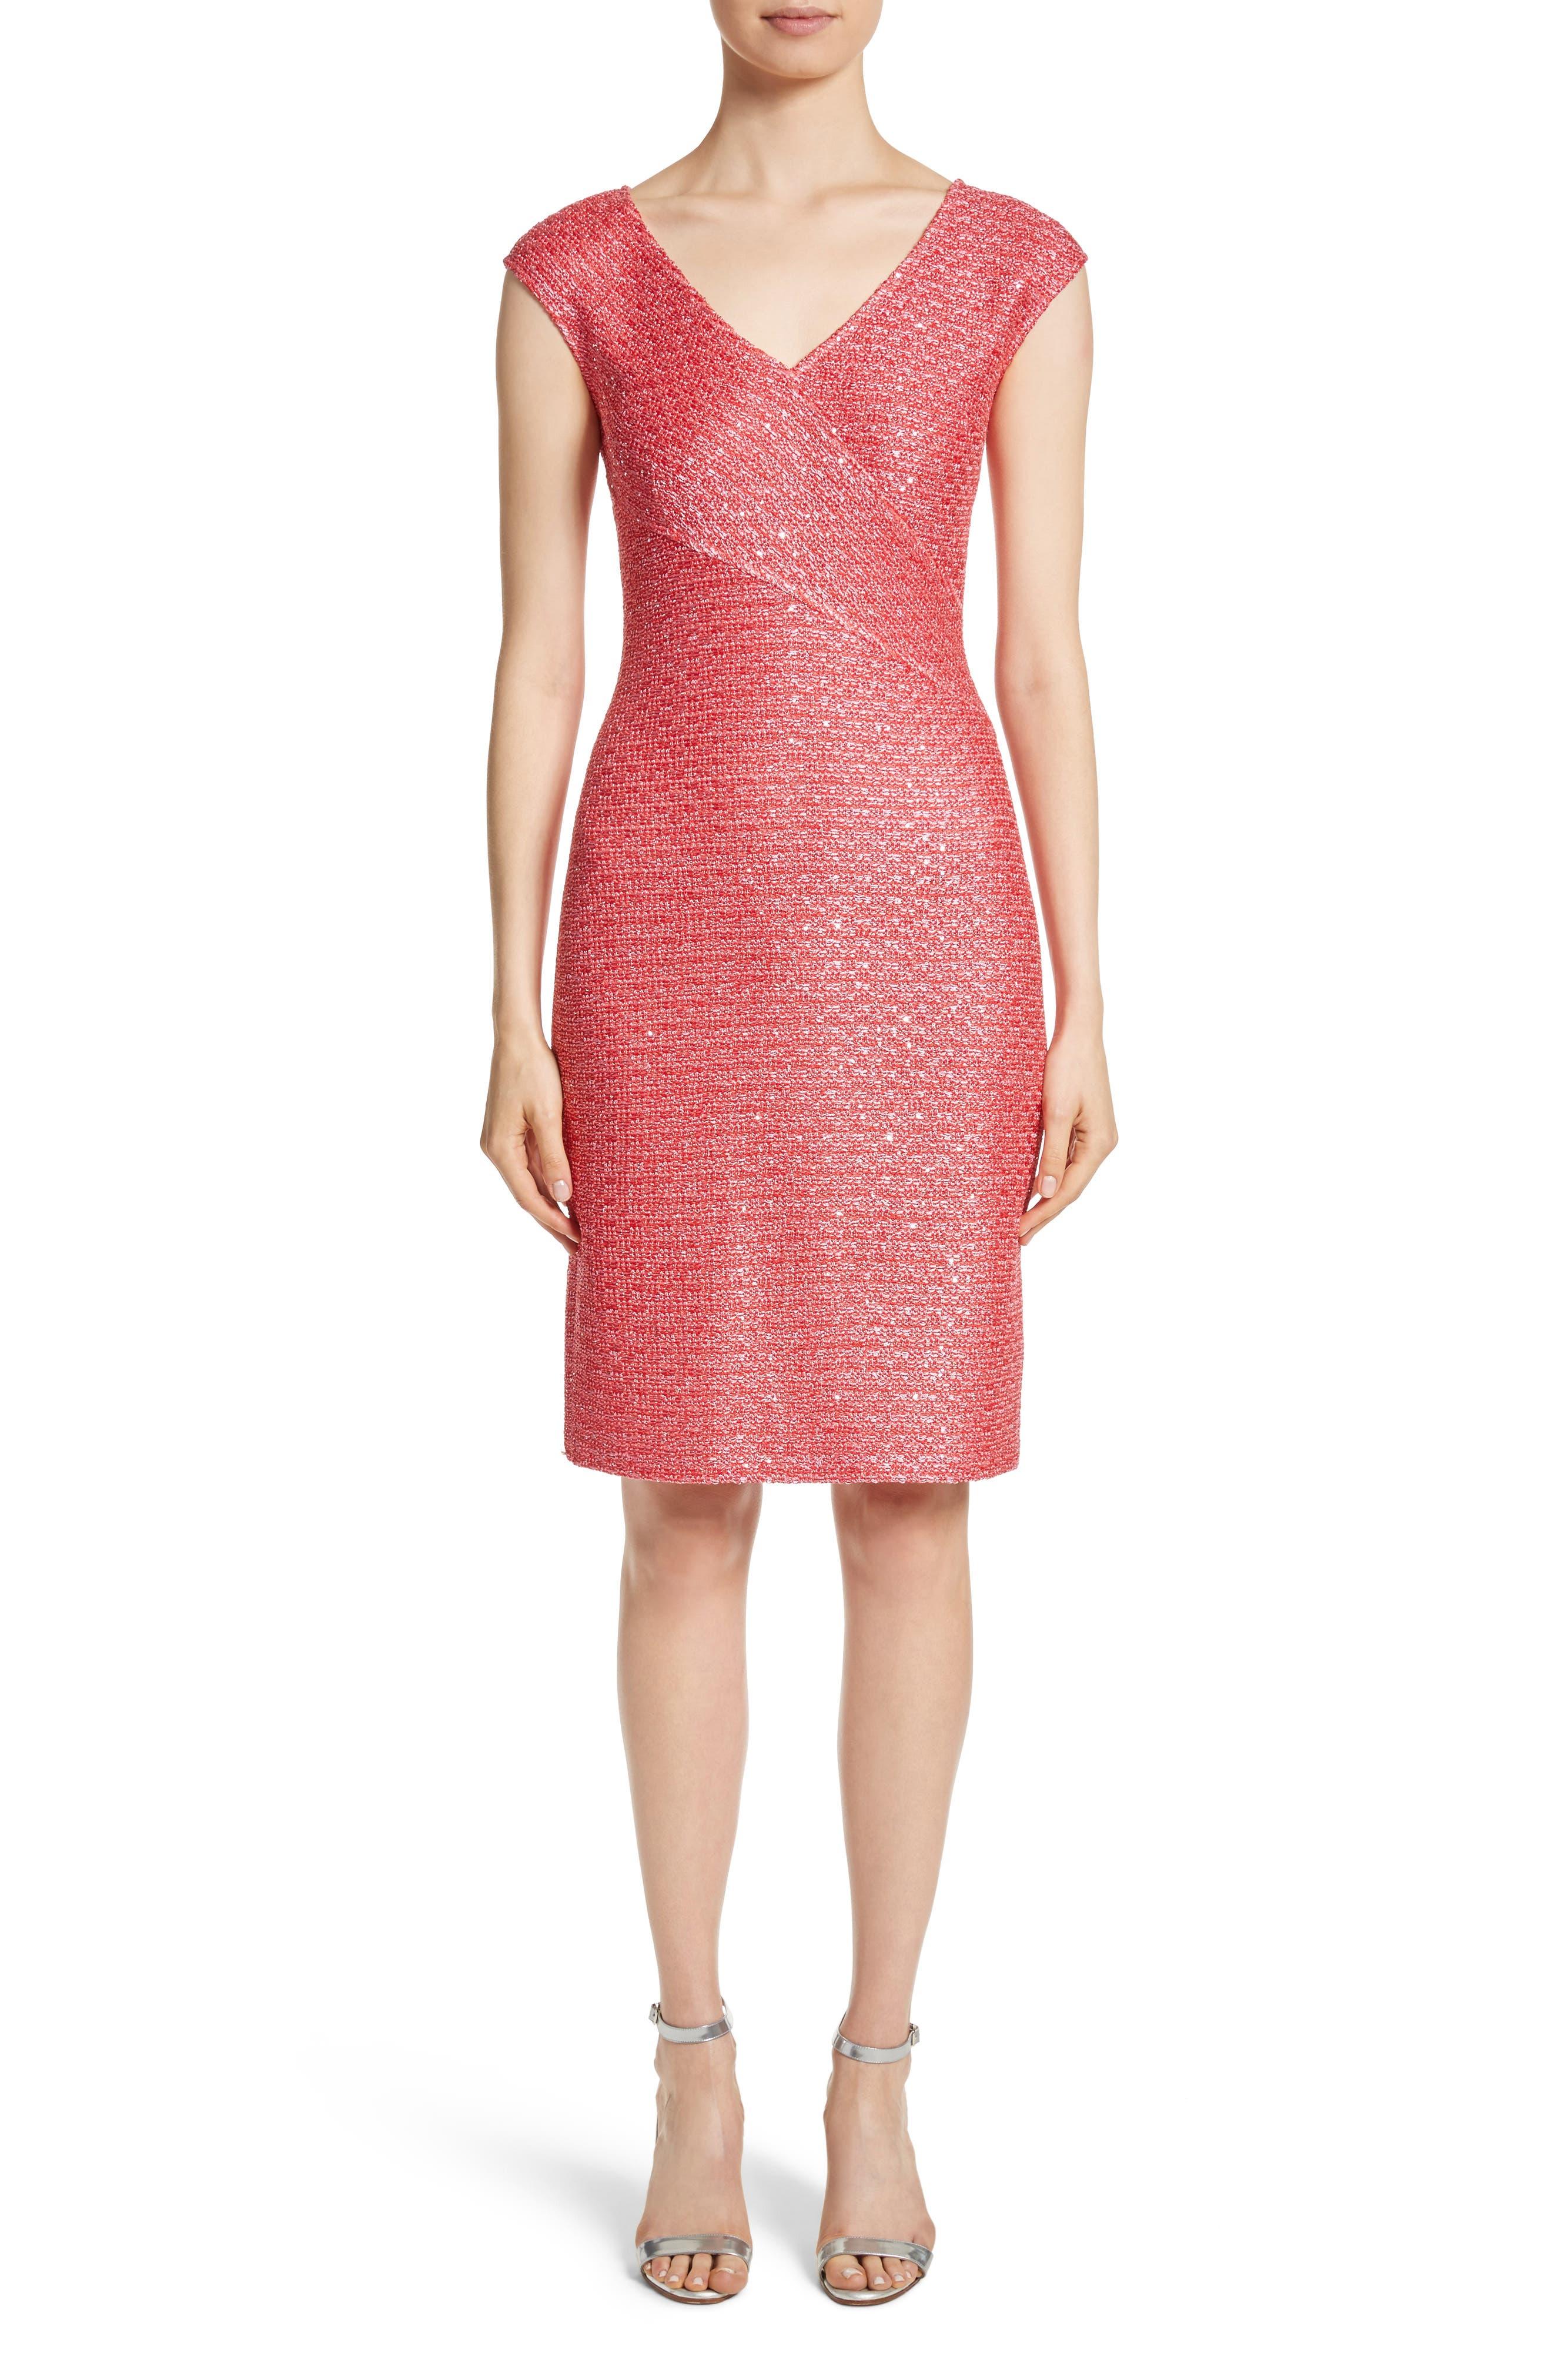 Hansh Knit Dress,                             Main thumbnail 1, color,                             Coral Multi